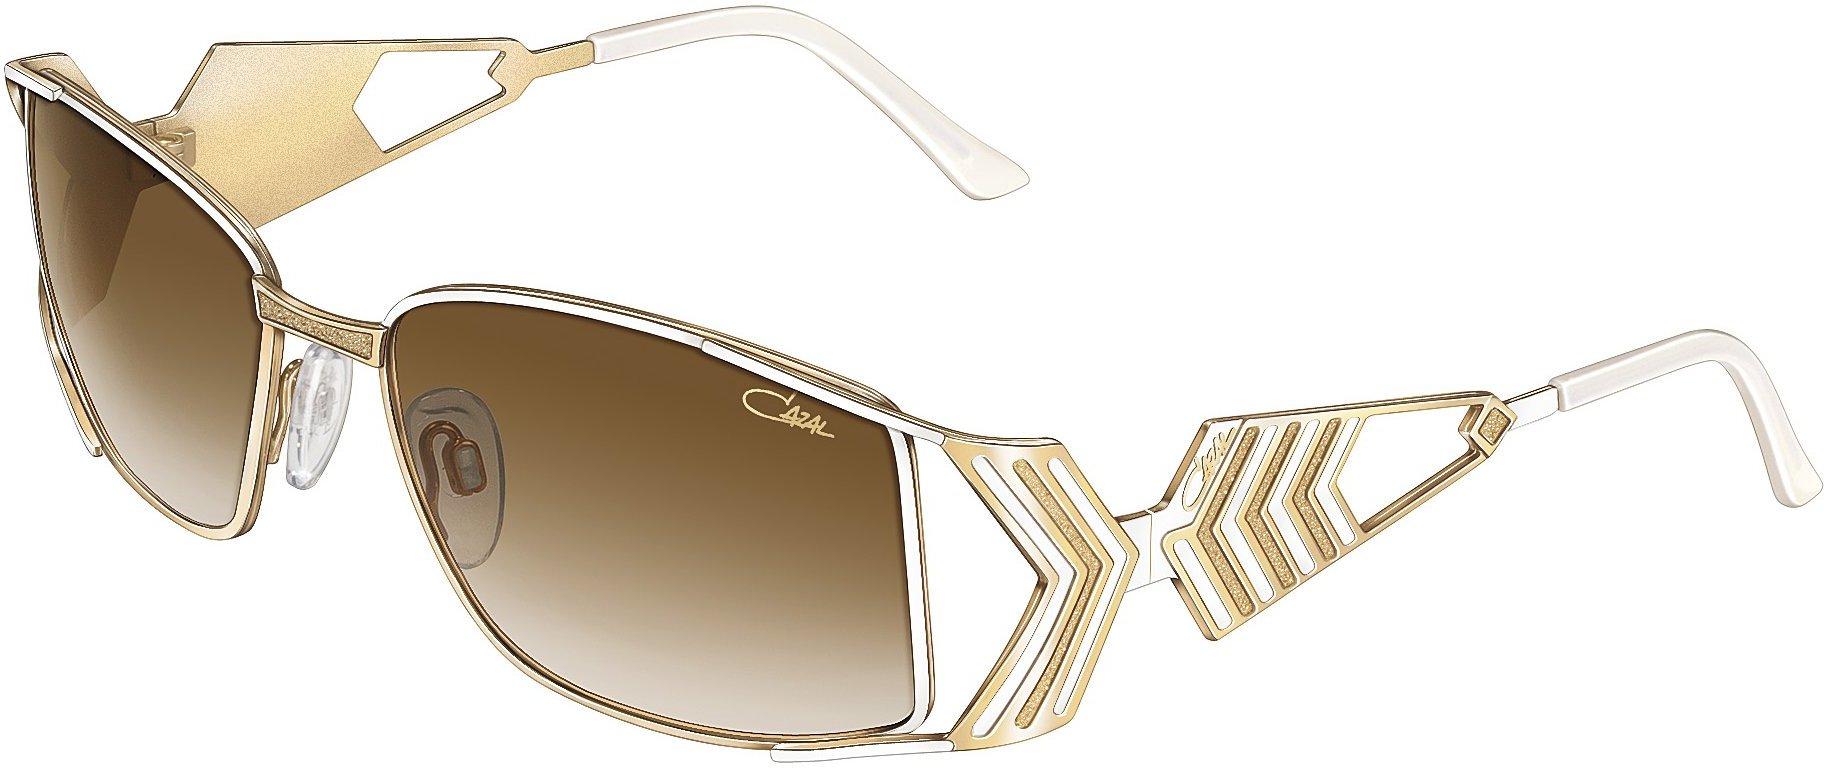 bccbef2767 Cazal Sunglasses 9011